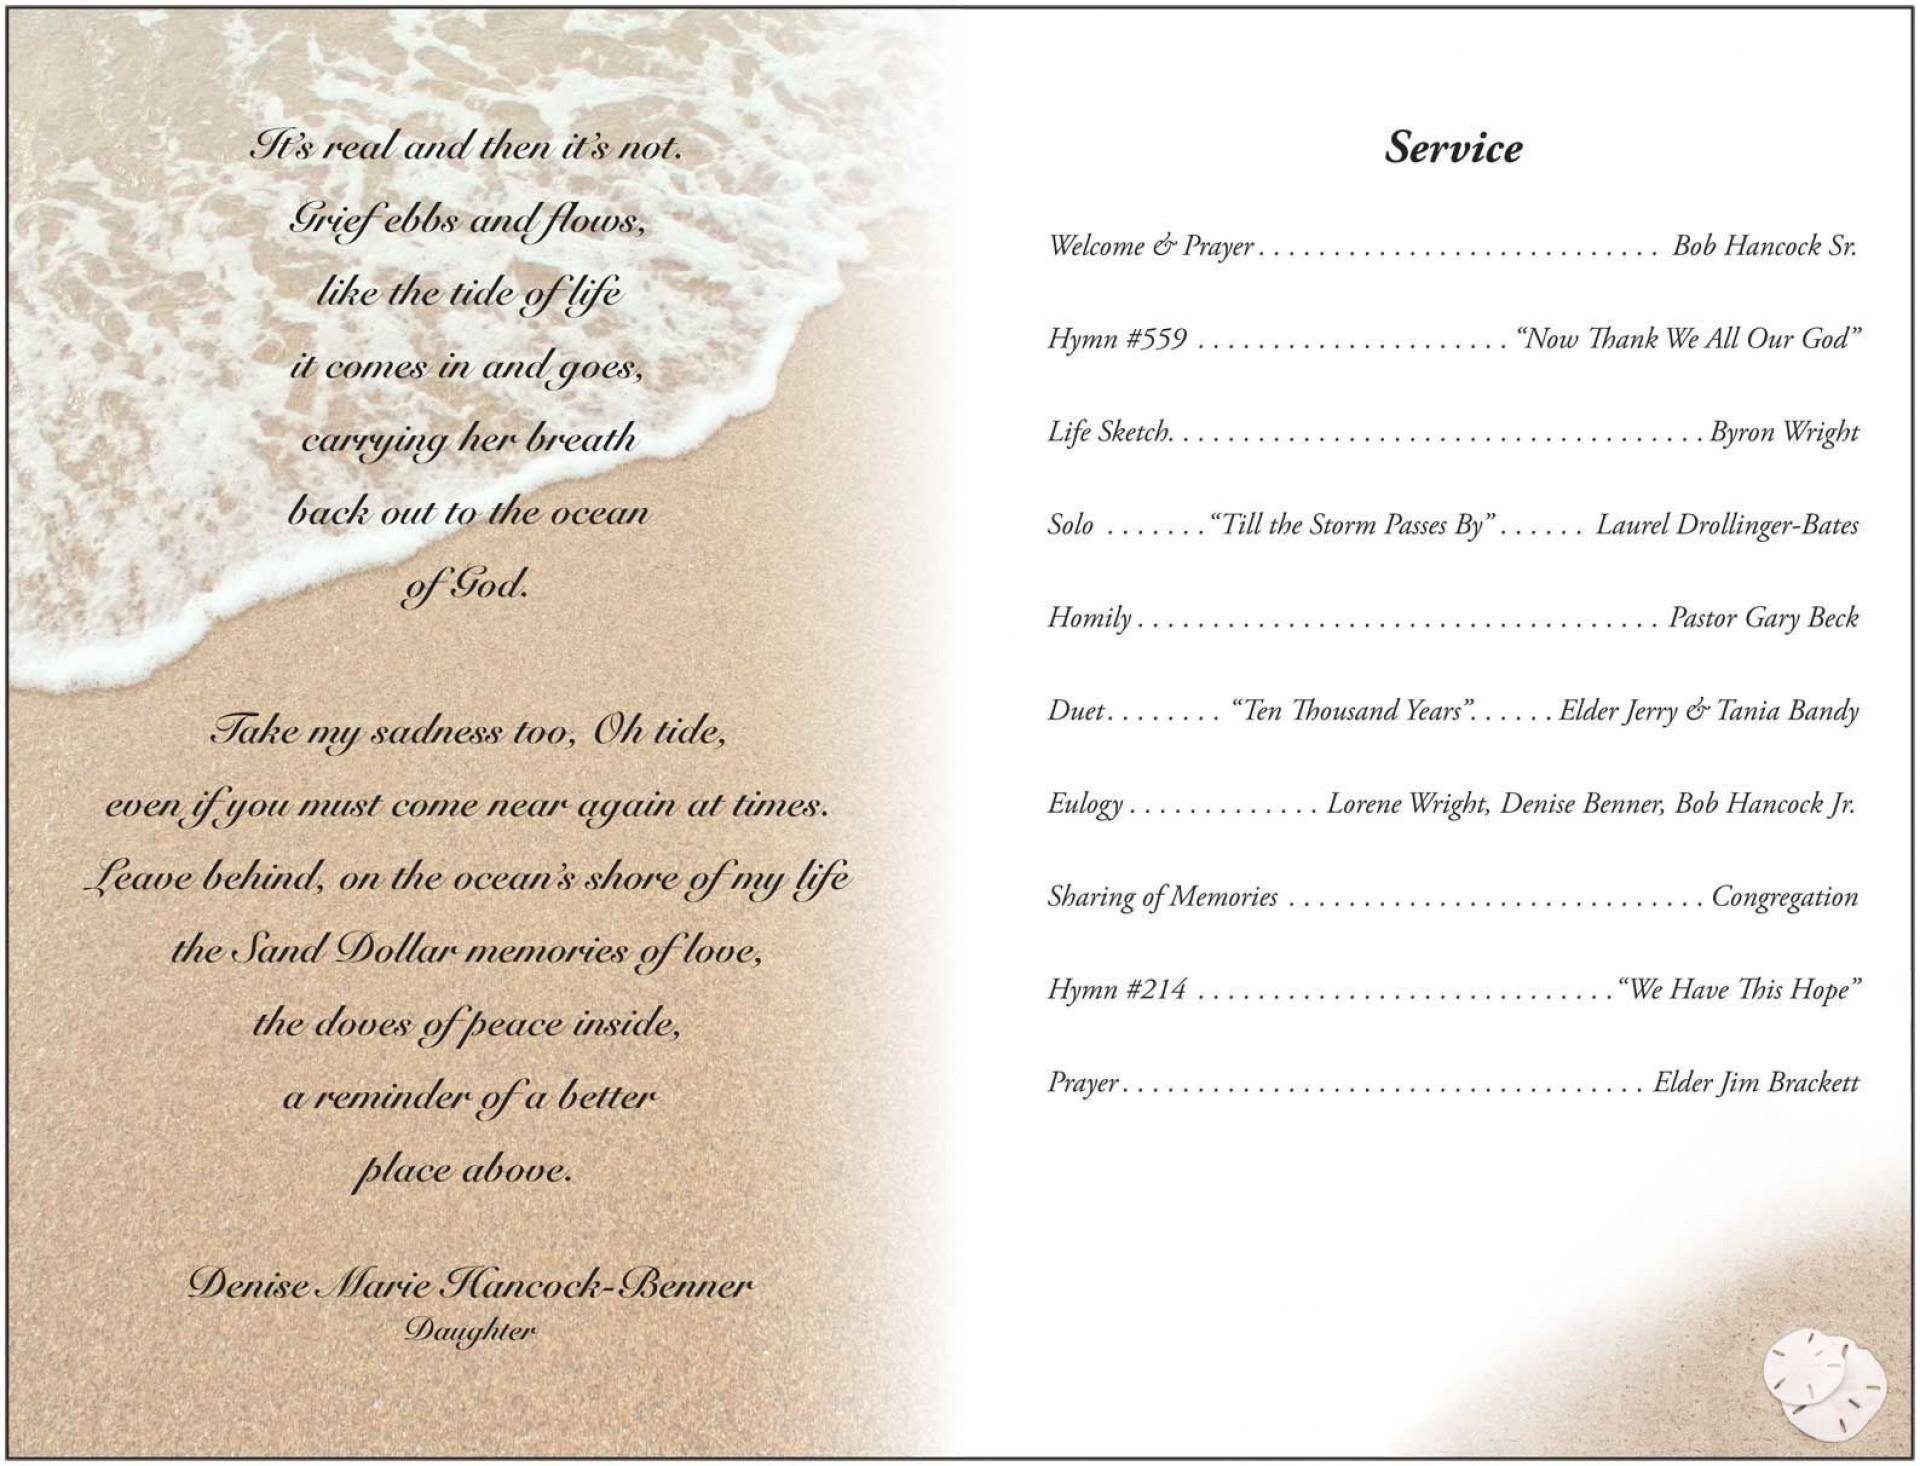 006 Stupendou Catholic Funeral Program Template Idea  Mas Layout Free1920